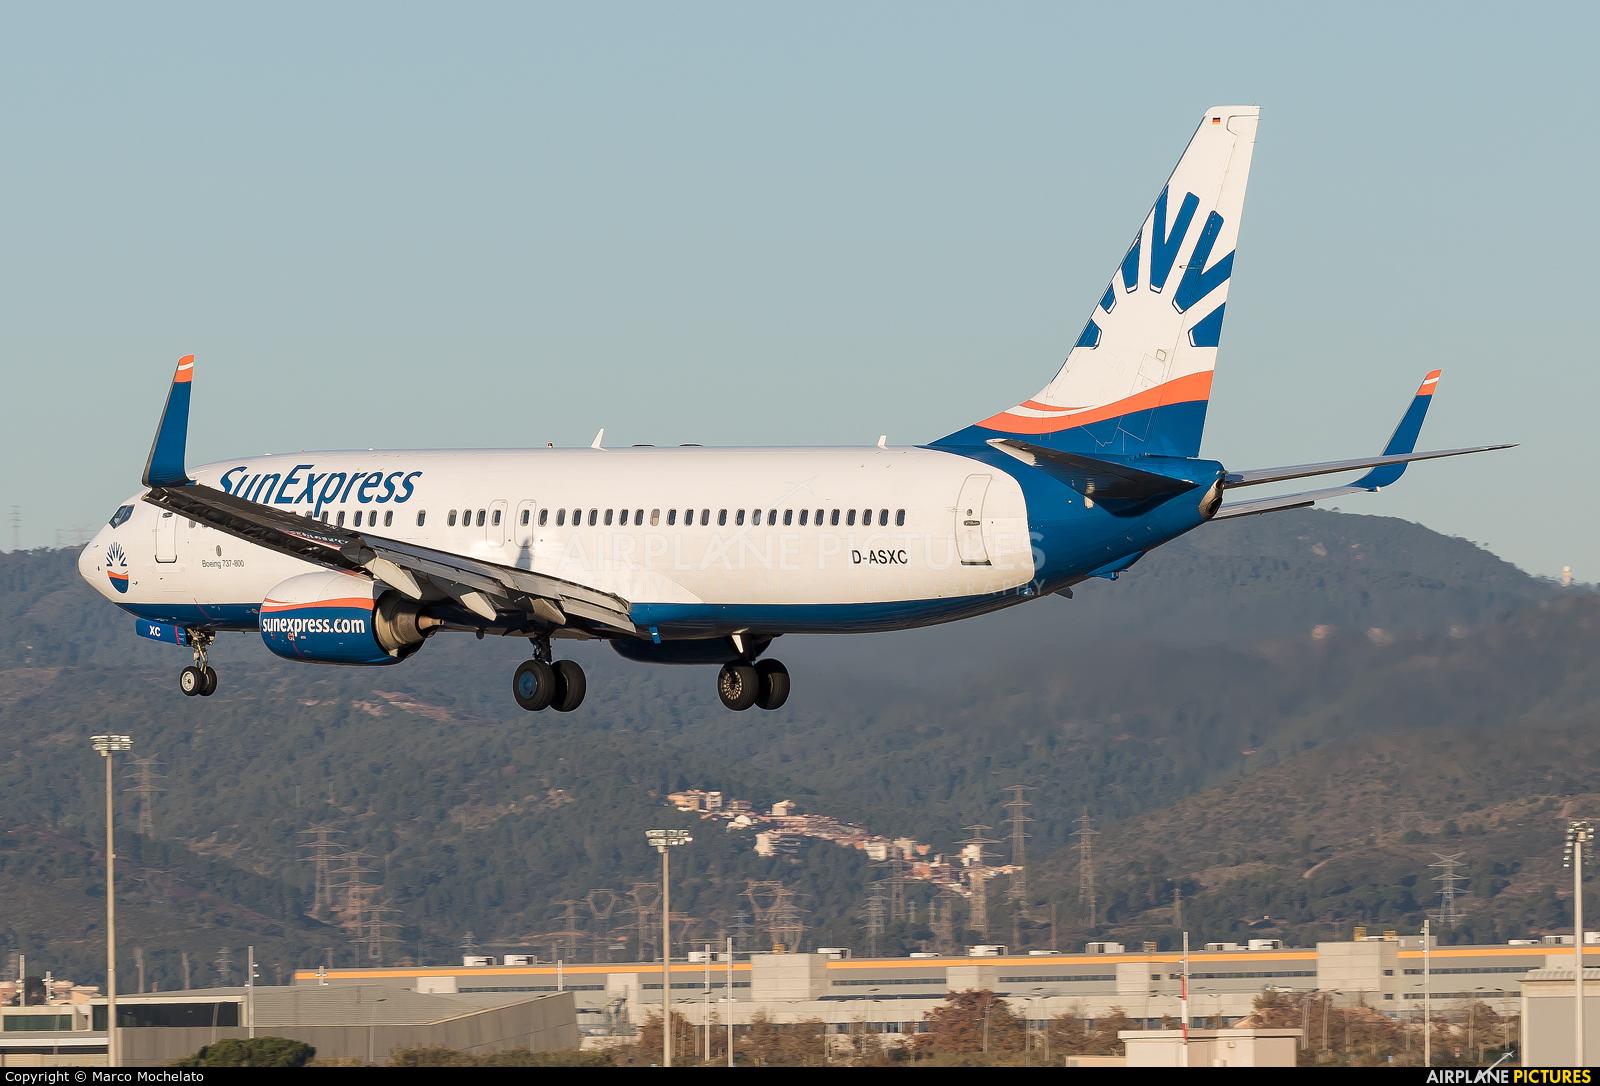 SunExpress Germany D-ASXC aircraft at Barcelona - El Prat